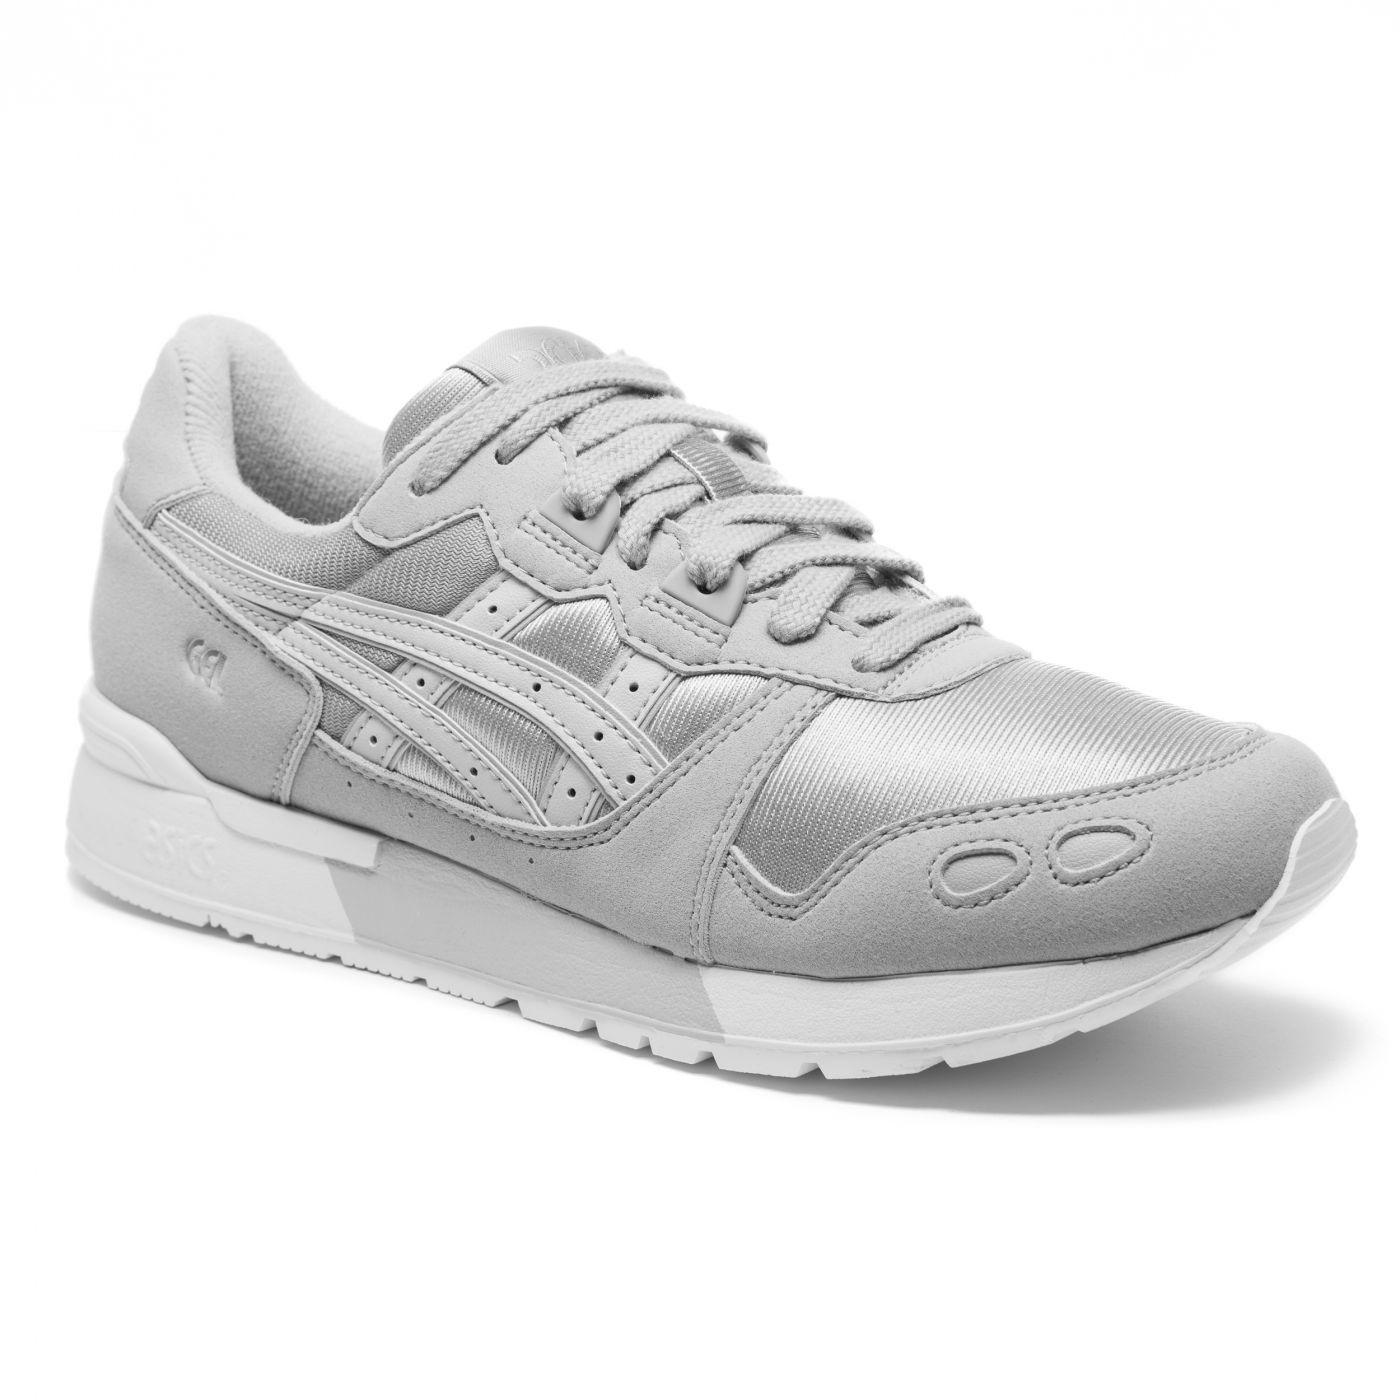 ASICS Men's Gel Lyte Trainers Grey 4549846123024 - 10.5 UK Grey Silver